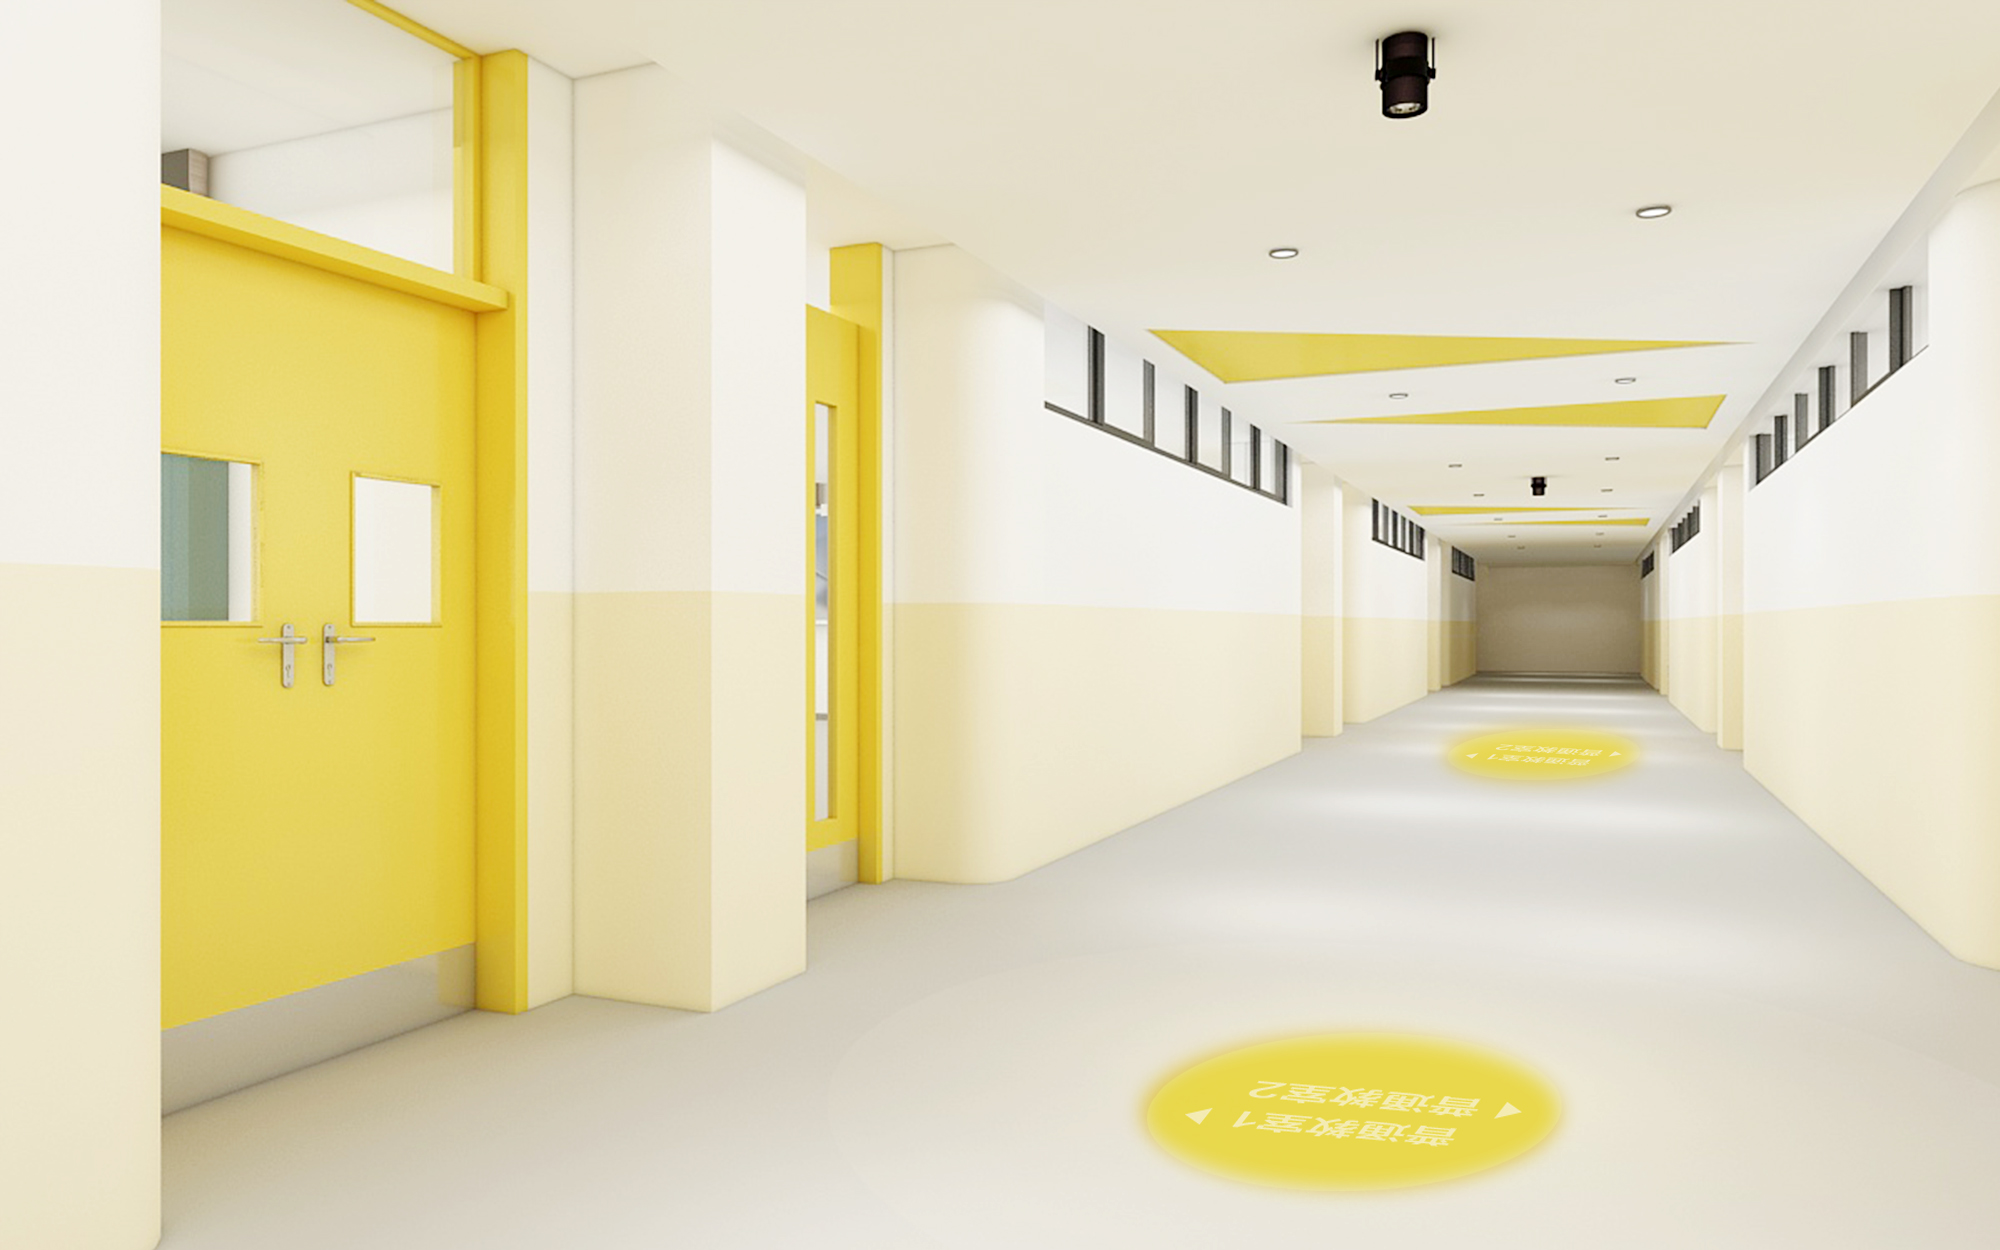 黄色教室走廊